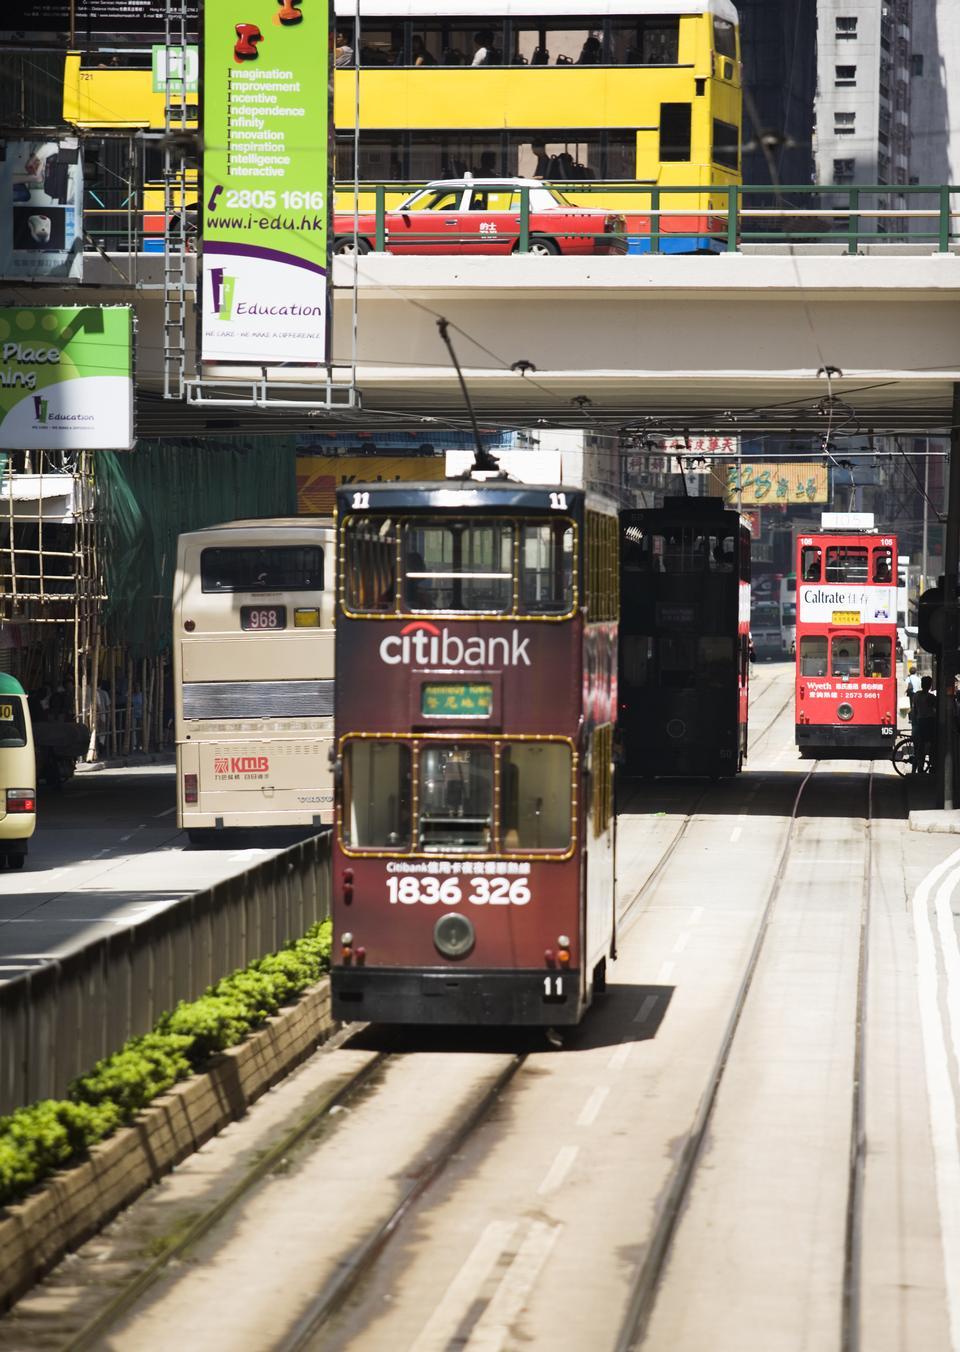 Double-decker trams in Hong Kong